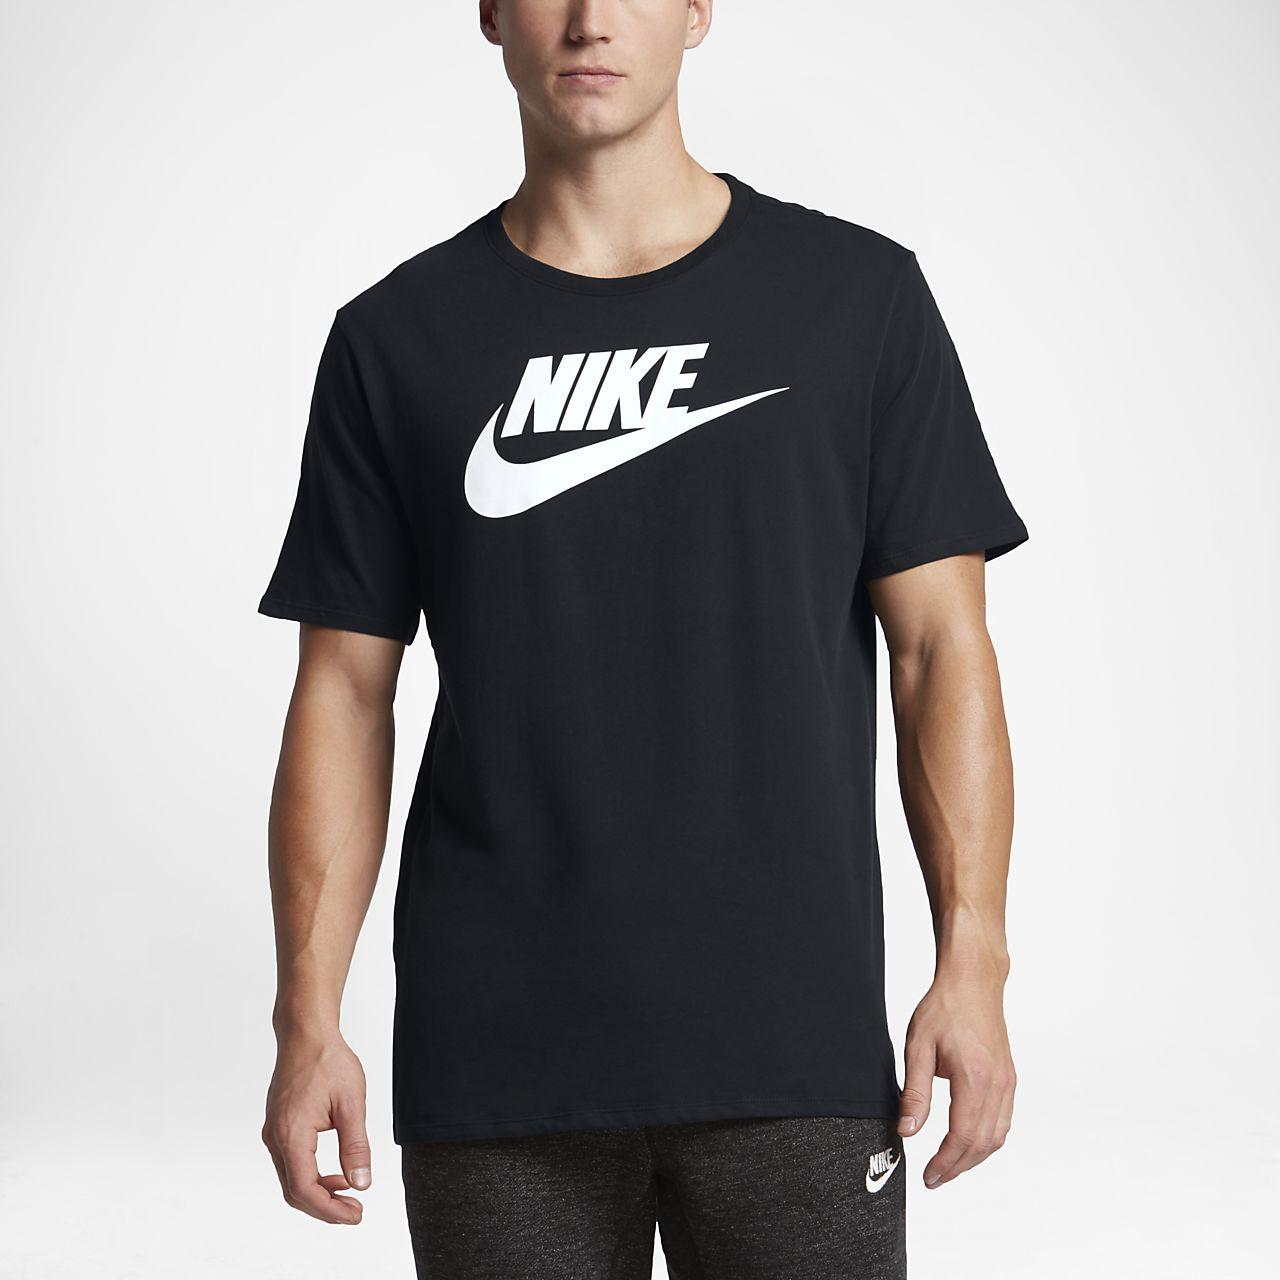 Nike sportswear men 39 s logo t shirt for Nike custom t shirts